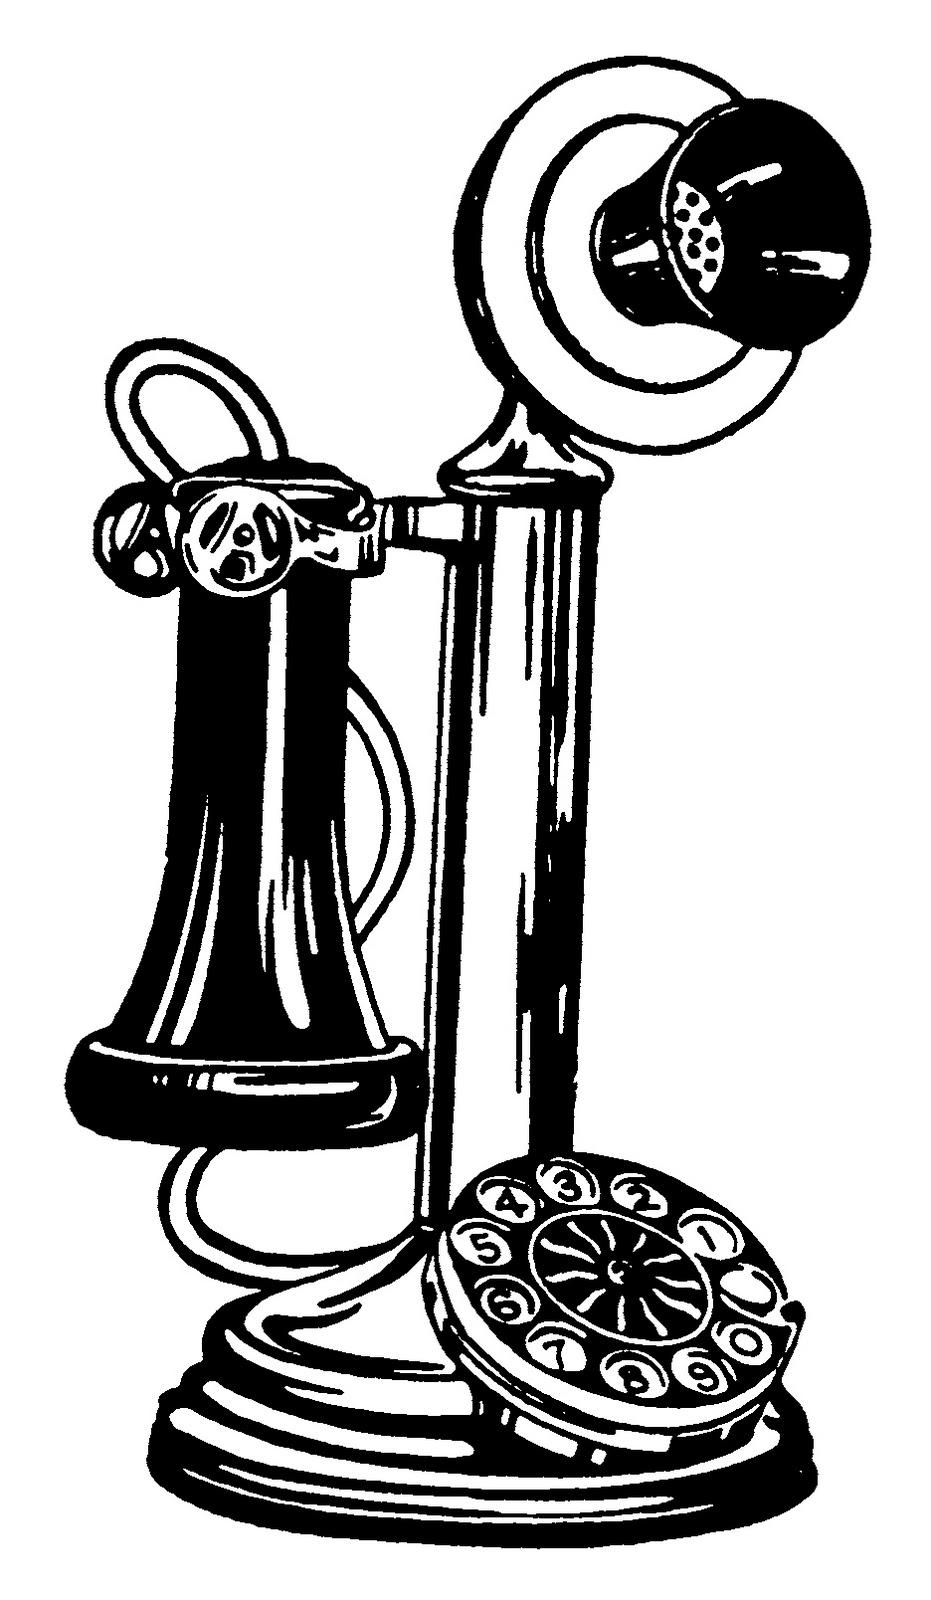 Free Vintage Clip Art Vintage Telephone -Free Vintage Clip Art Vintage Telephone Old Zjobn5vt Jpg-6